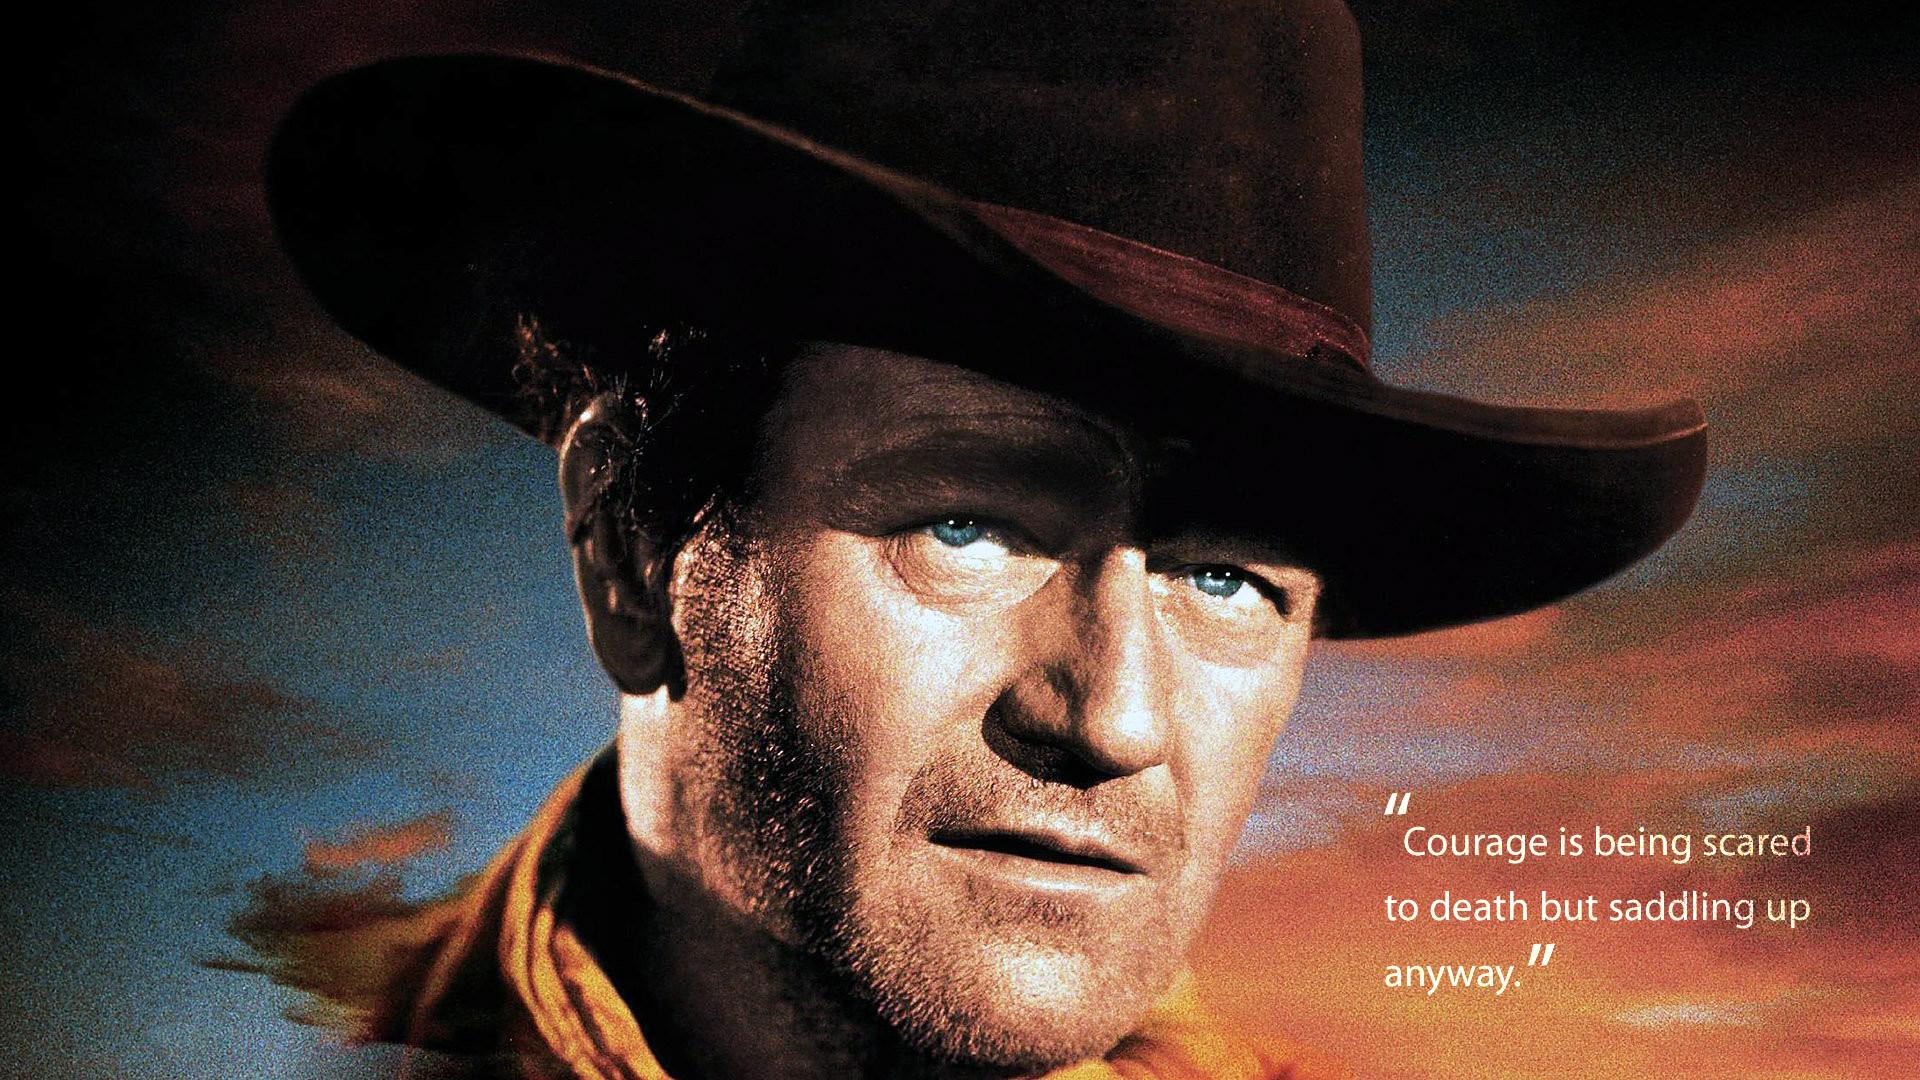 John Wayne Courage Quote HD Wallpaper FullHDWpp   Full HD 1920x1080